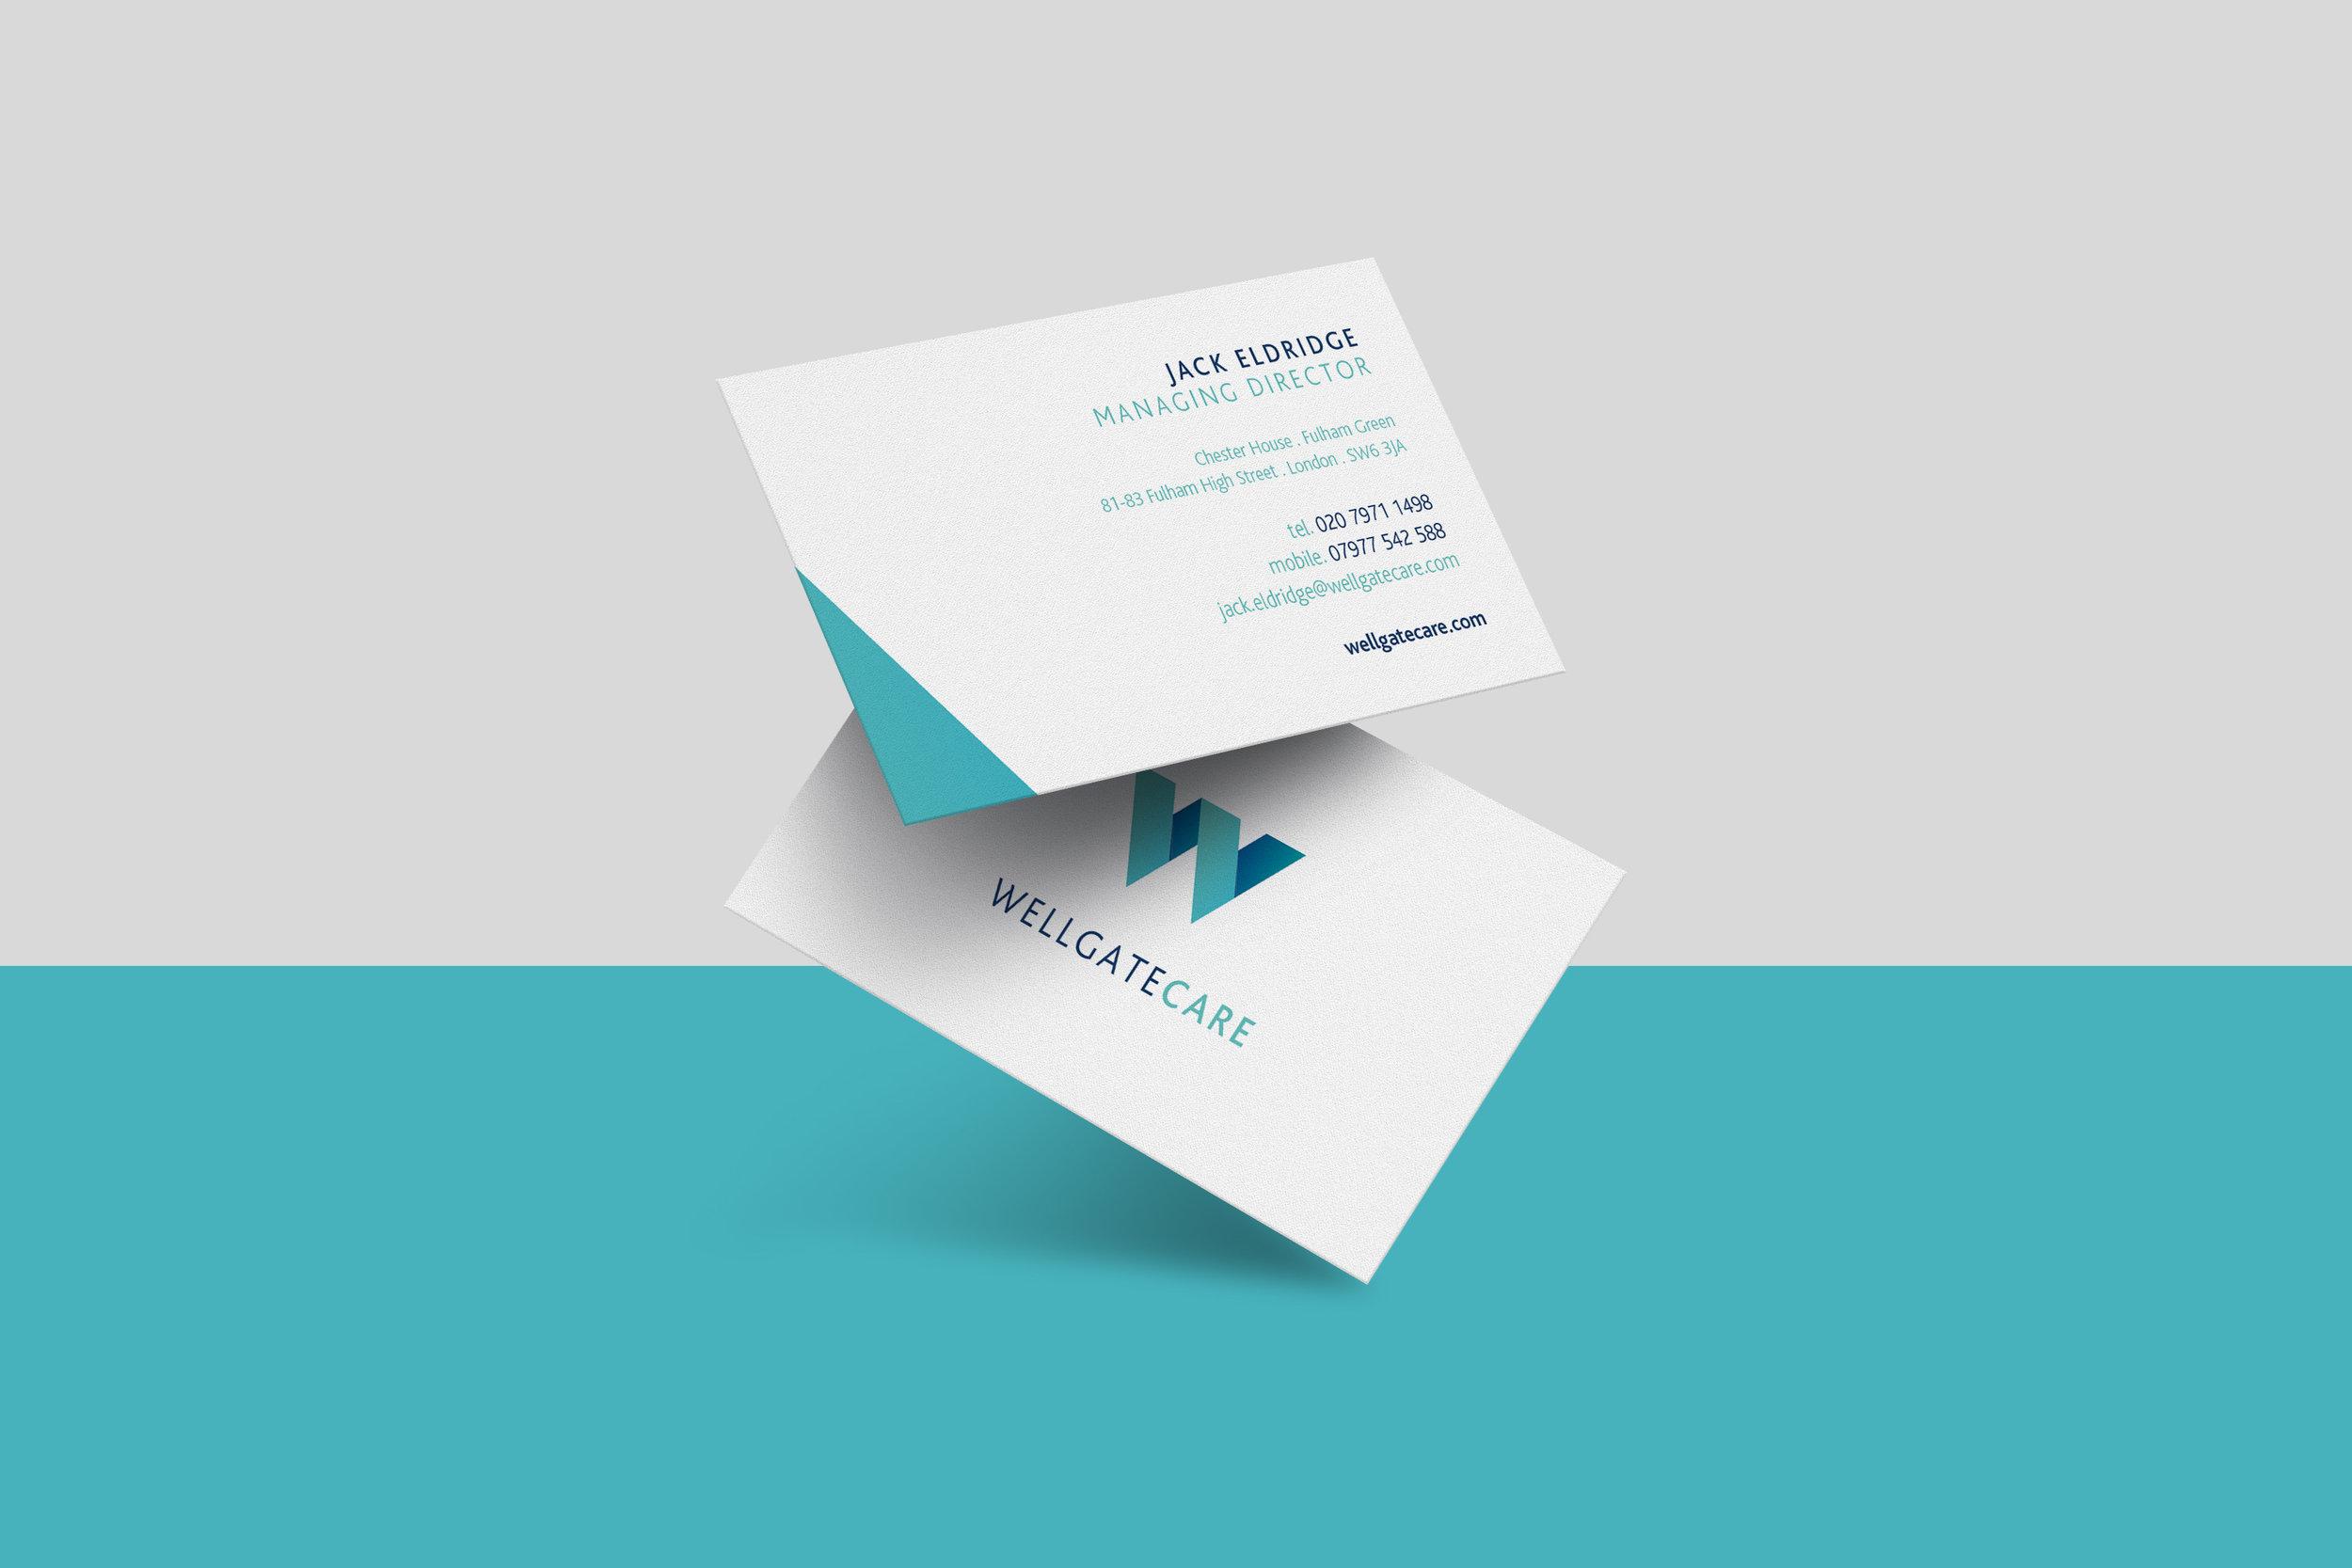 Wellgate Business Card Mockup.jpg